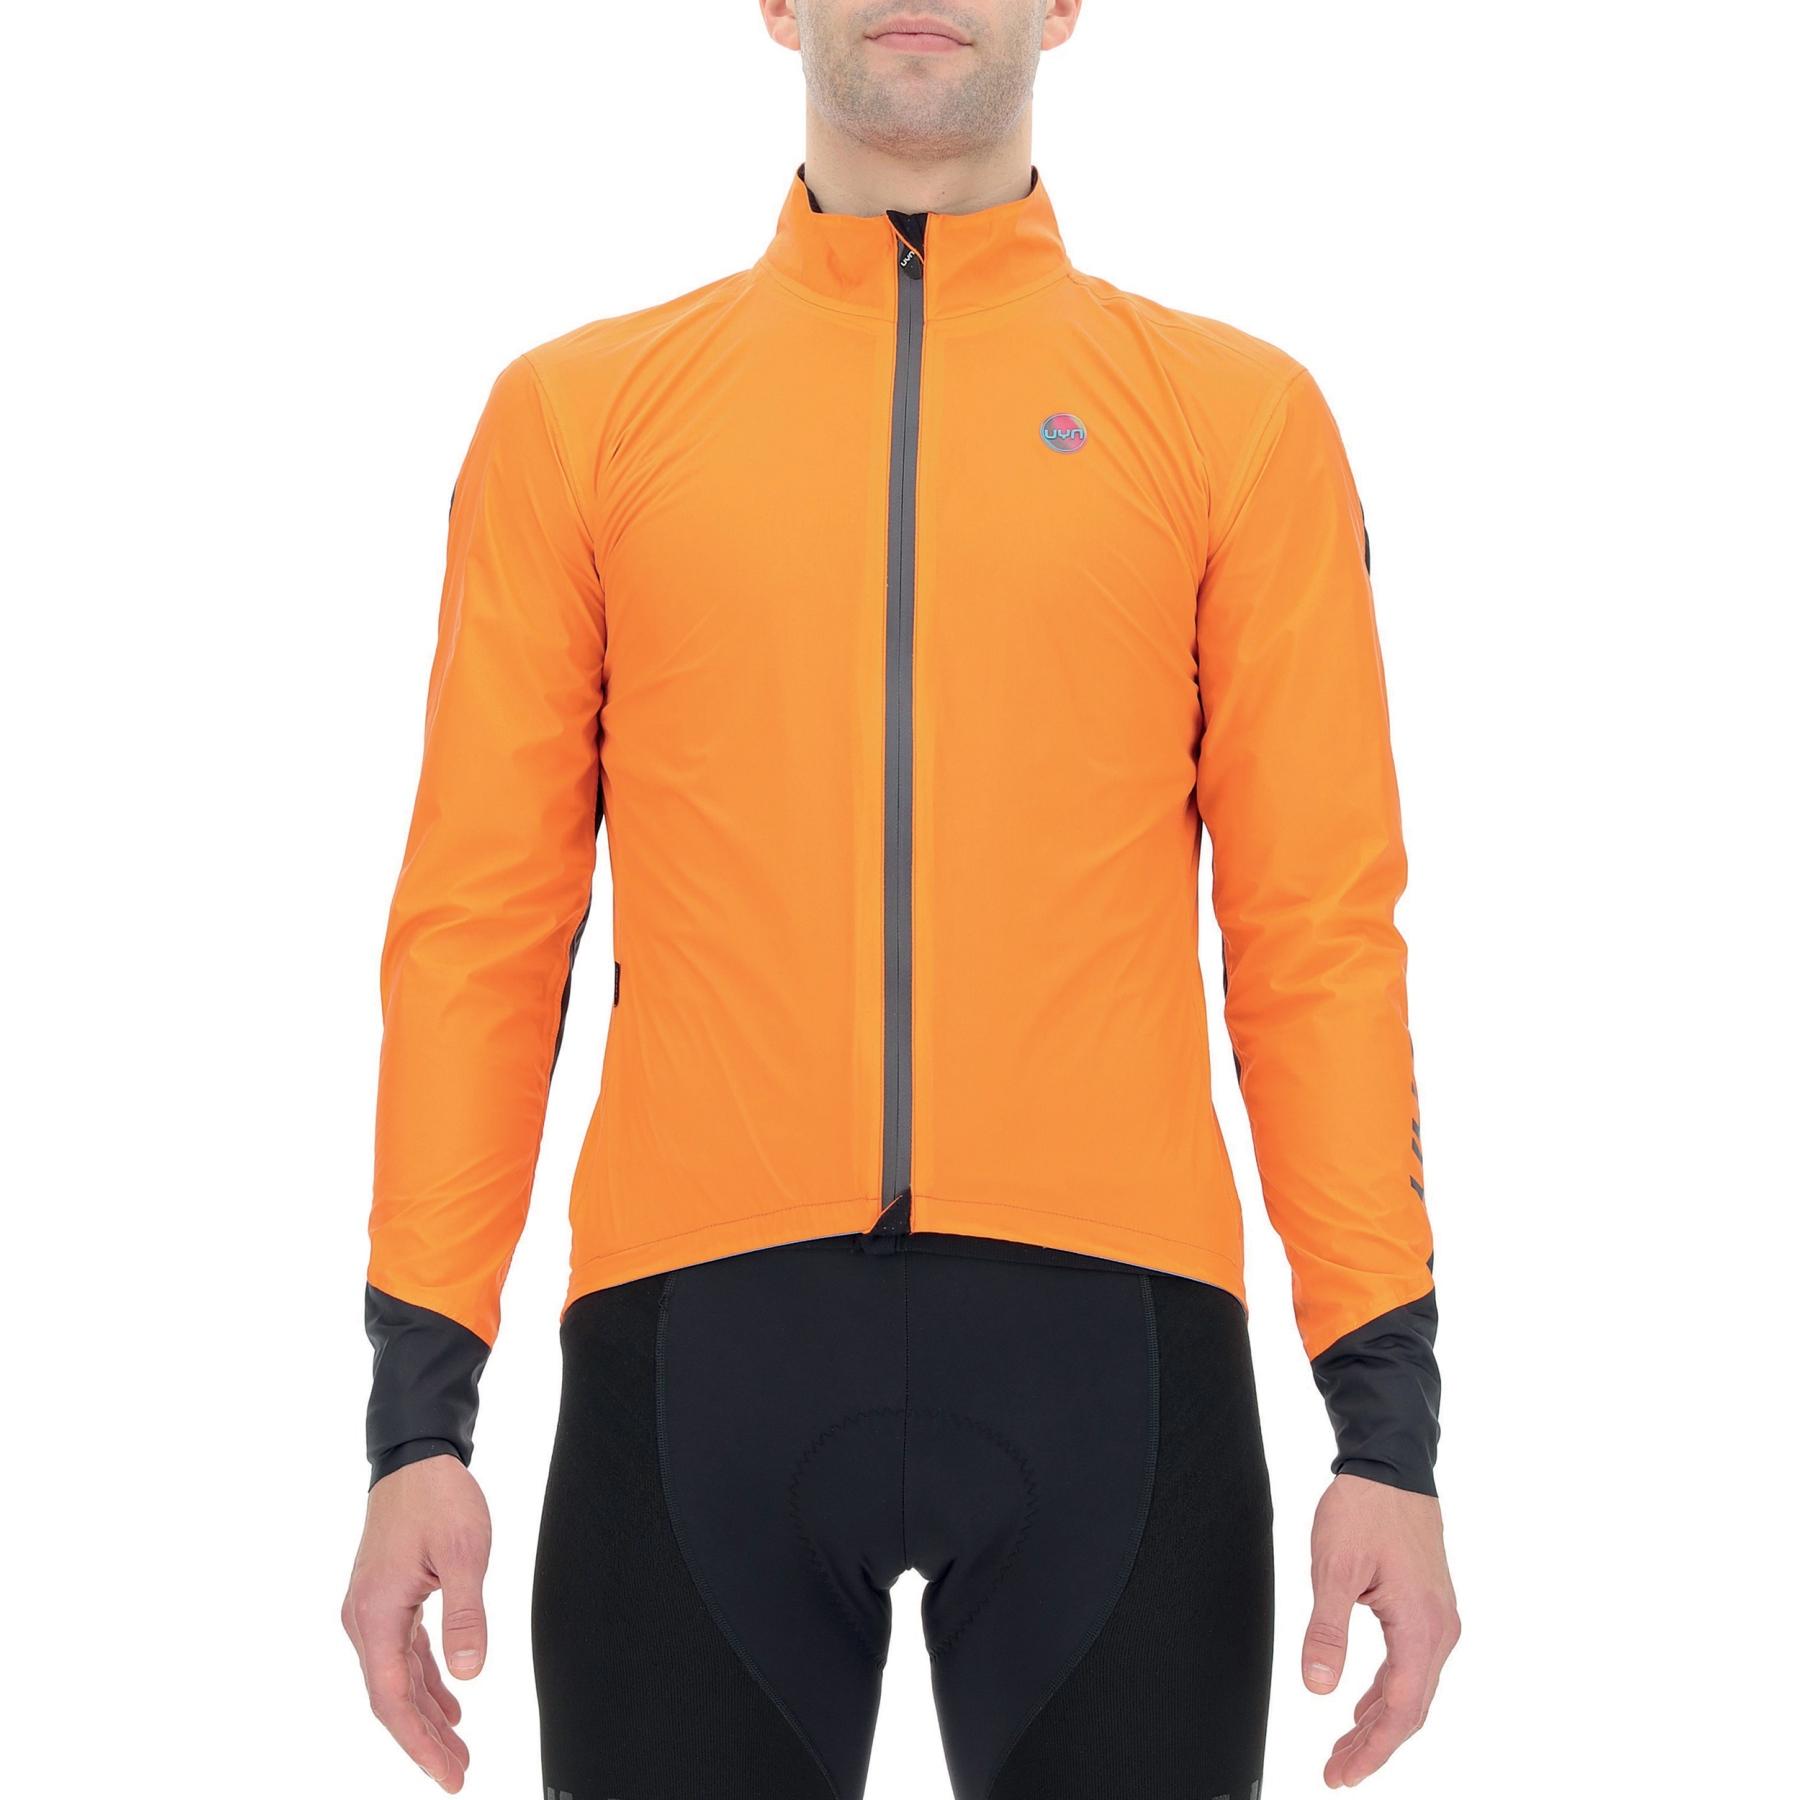 Image of UYN Biking Packable Aerofit Jacket - Orange/Black